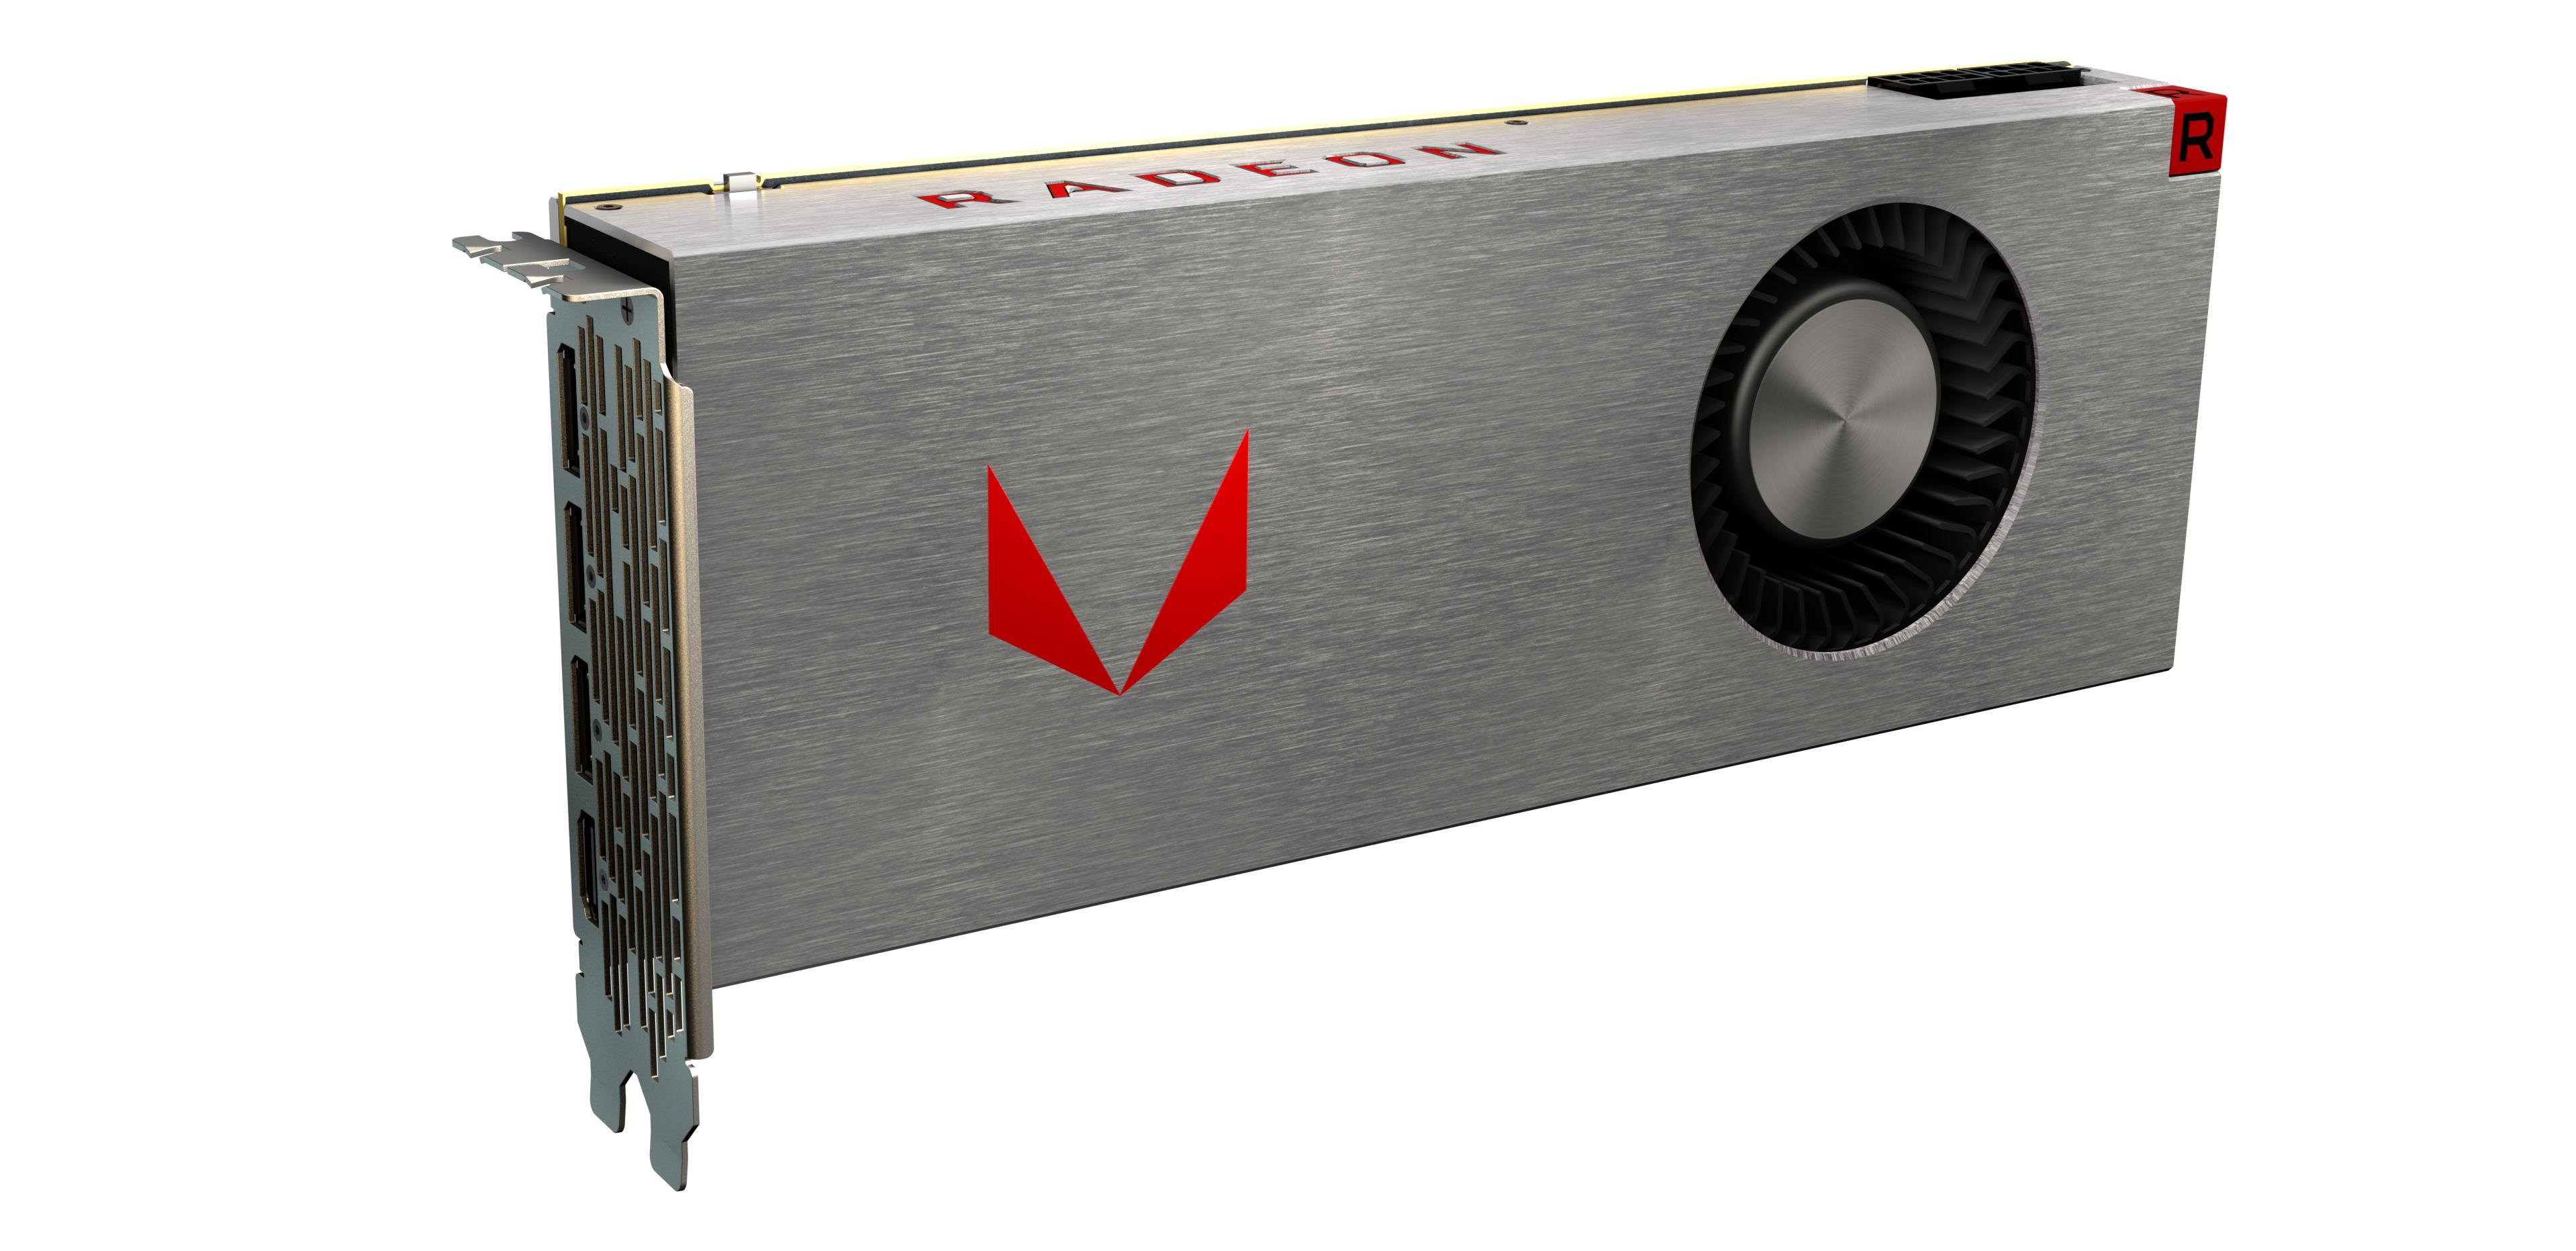 Final Words - The AMD Radeon RX Vega 64 & RX Vega 56 Review